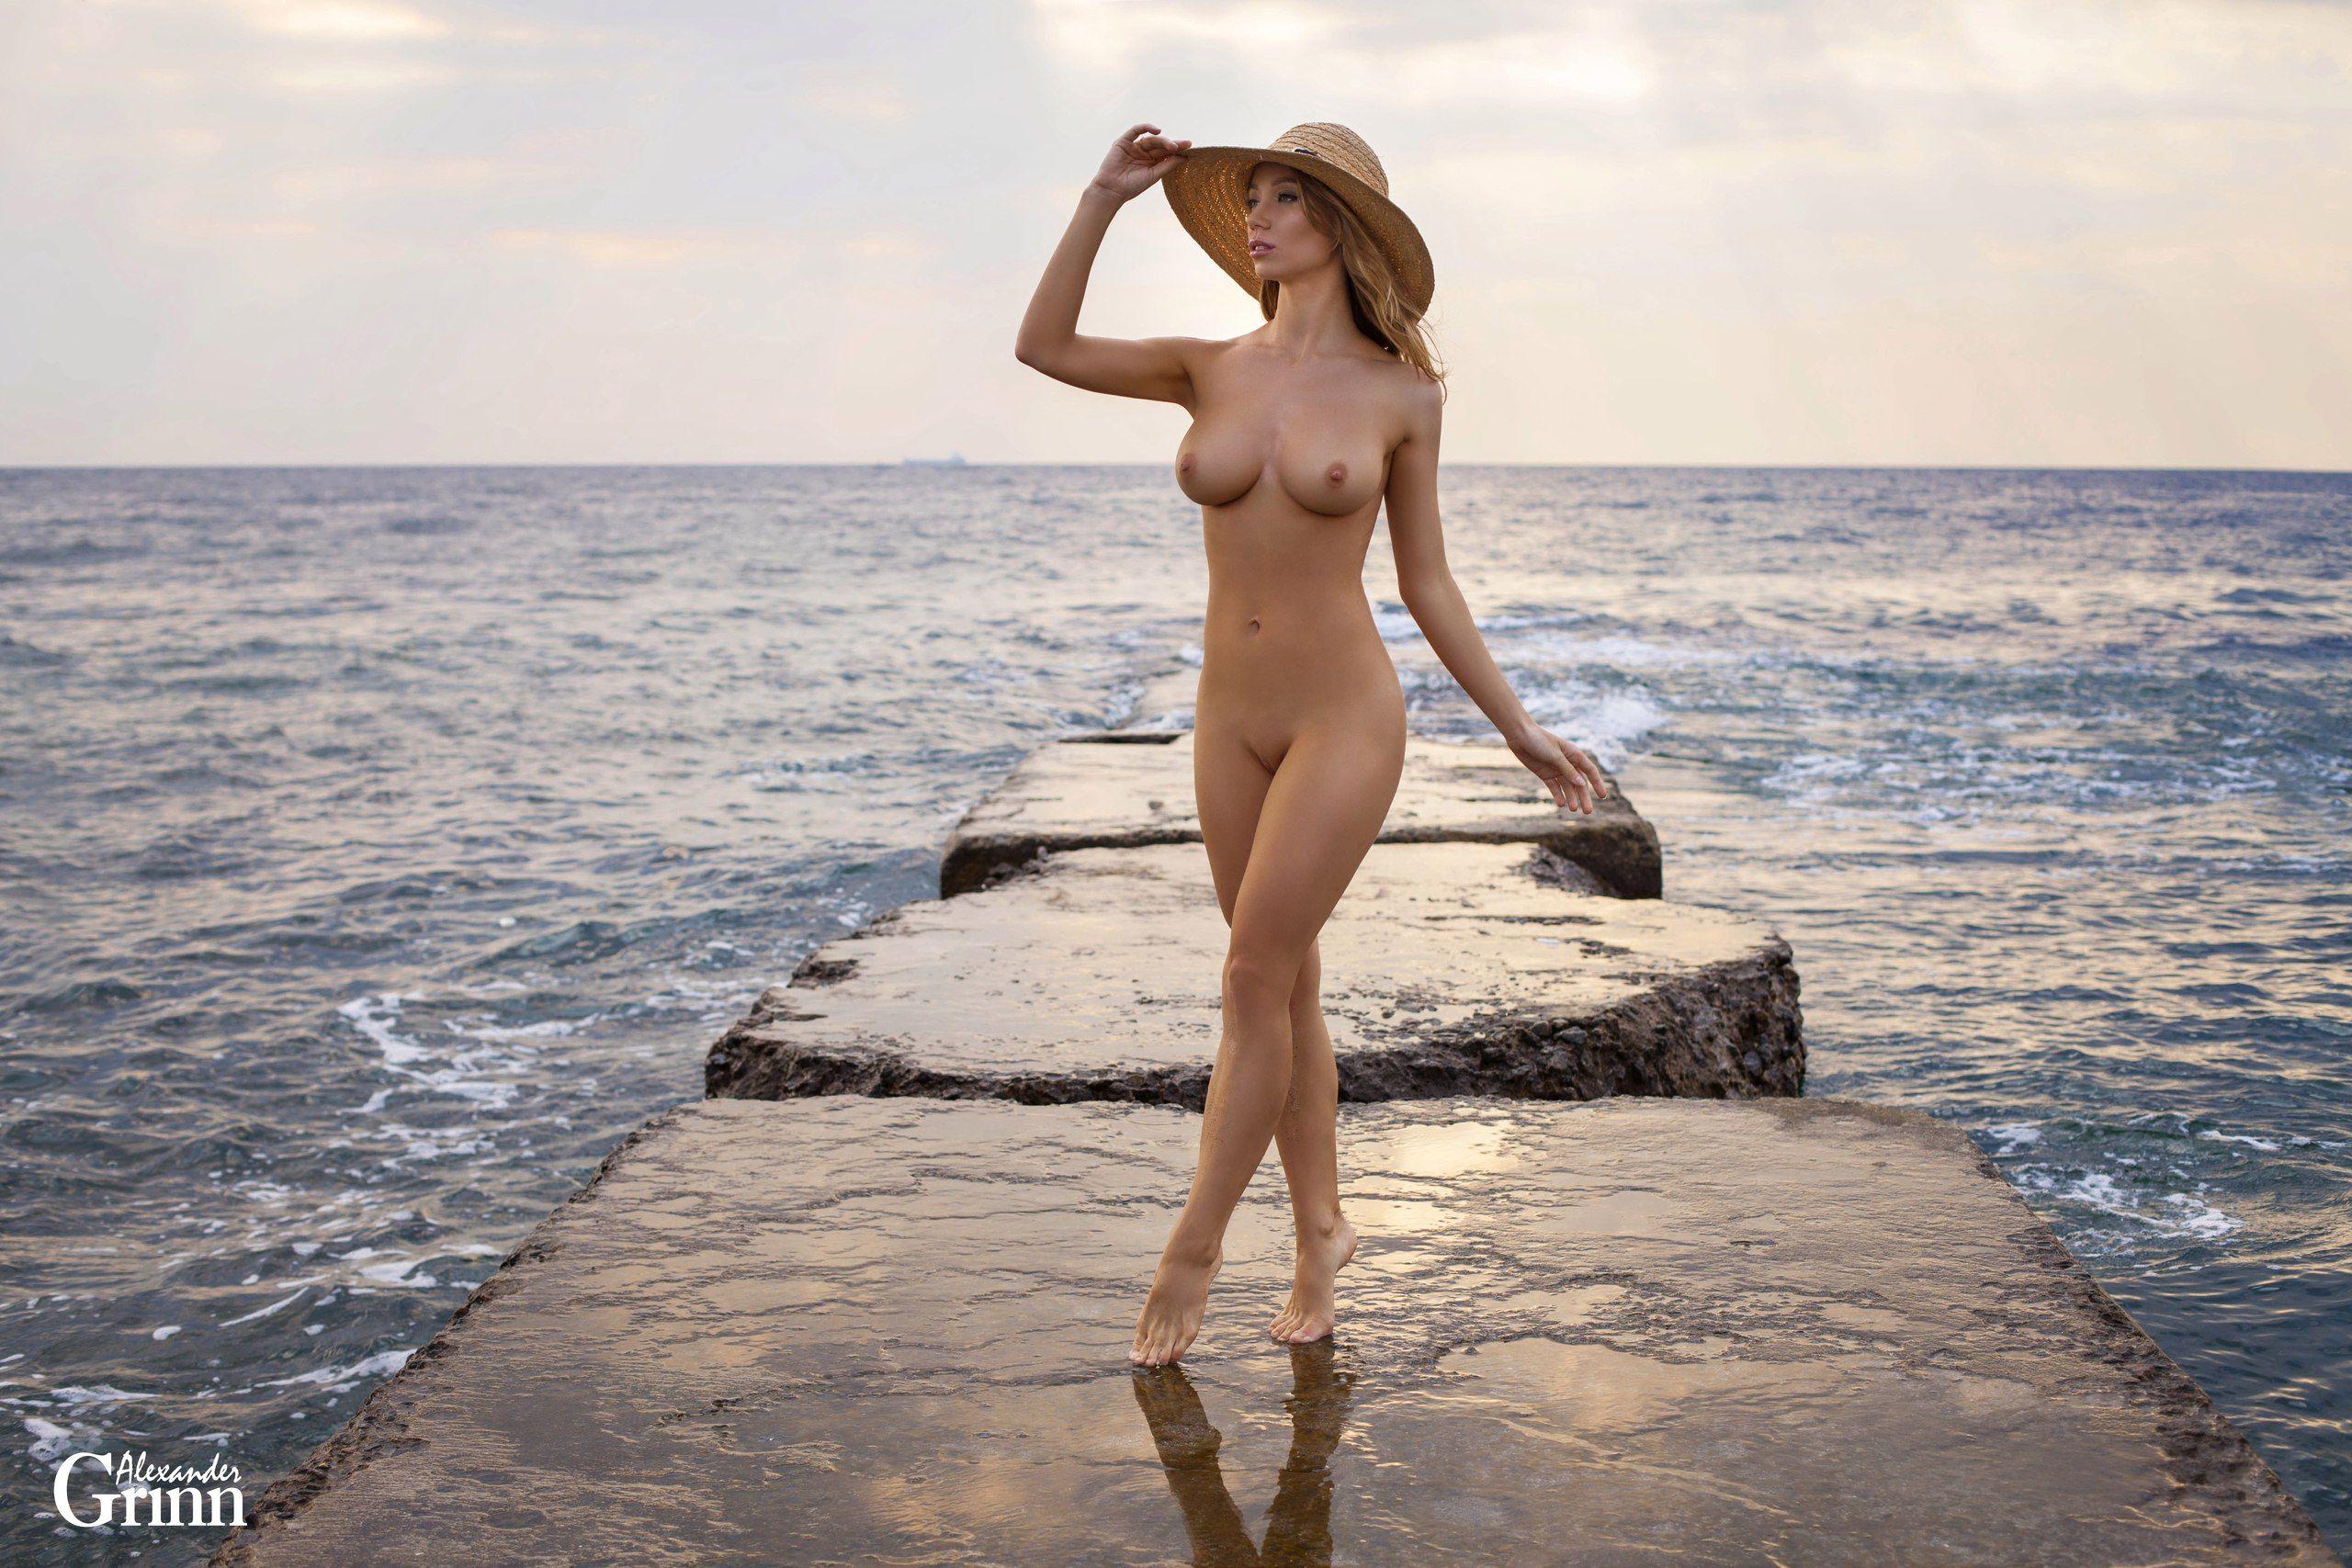 Alexander grinn, odessa, фотограф ню, model, nude photographer, Grinn, alexander grinn